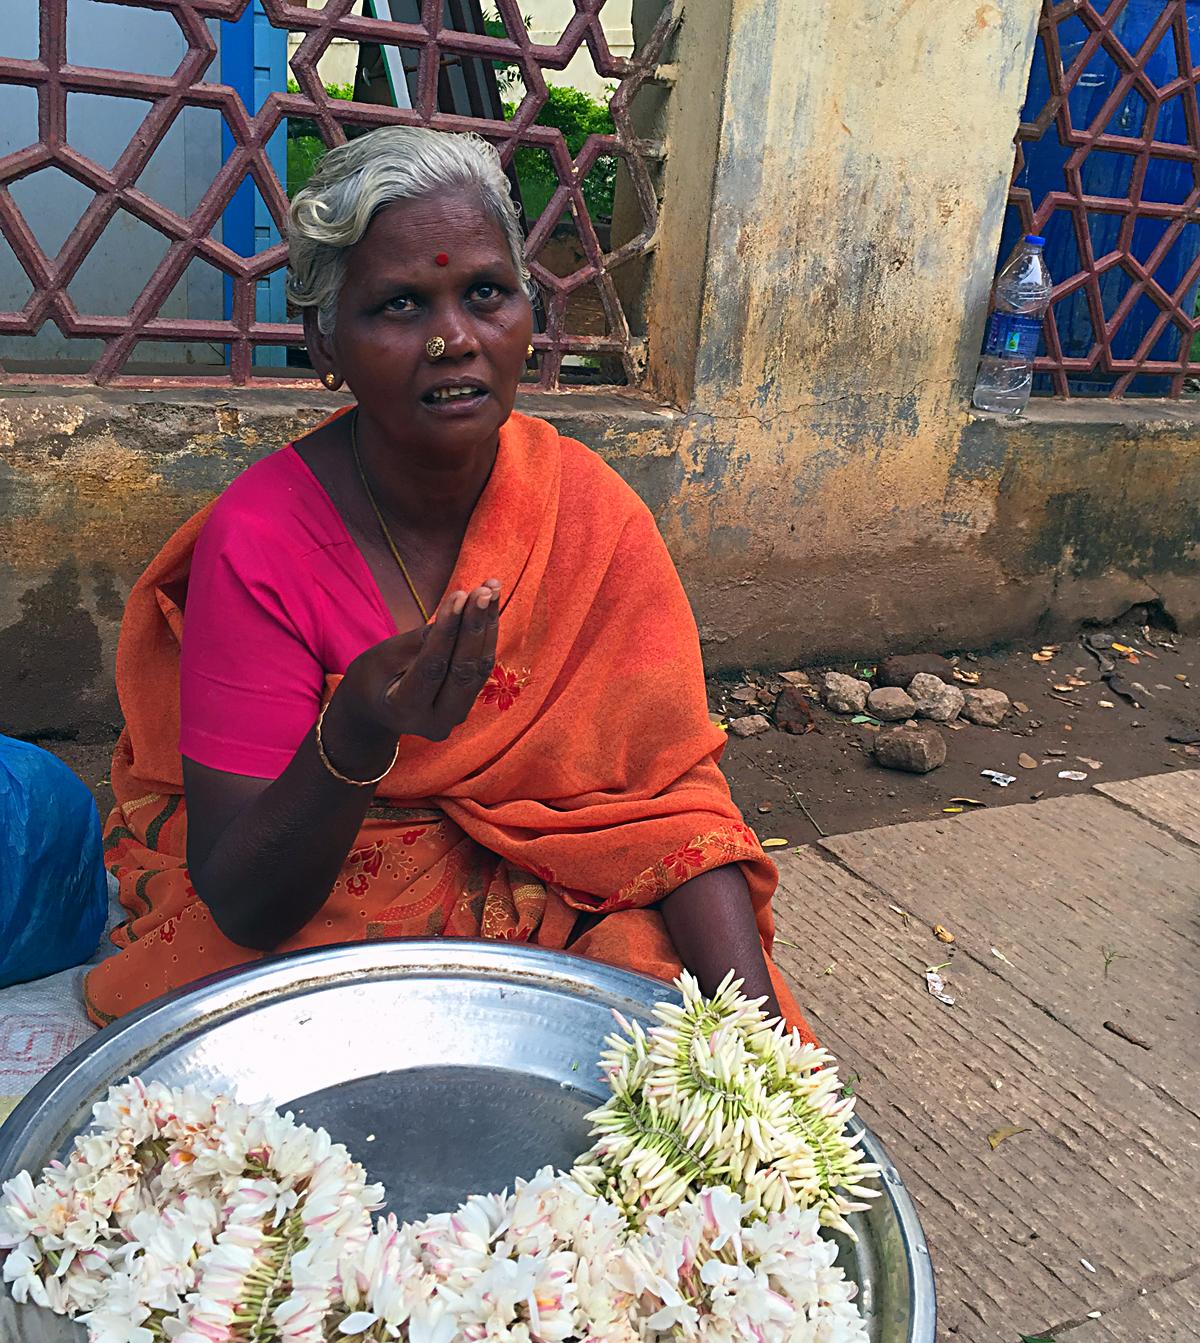 INDIEN Chennai Kanchipuram Tempel Menschen Tempel FINEST-onTour 2133.jpg